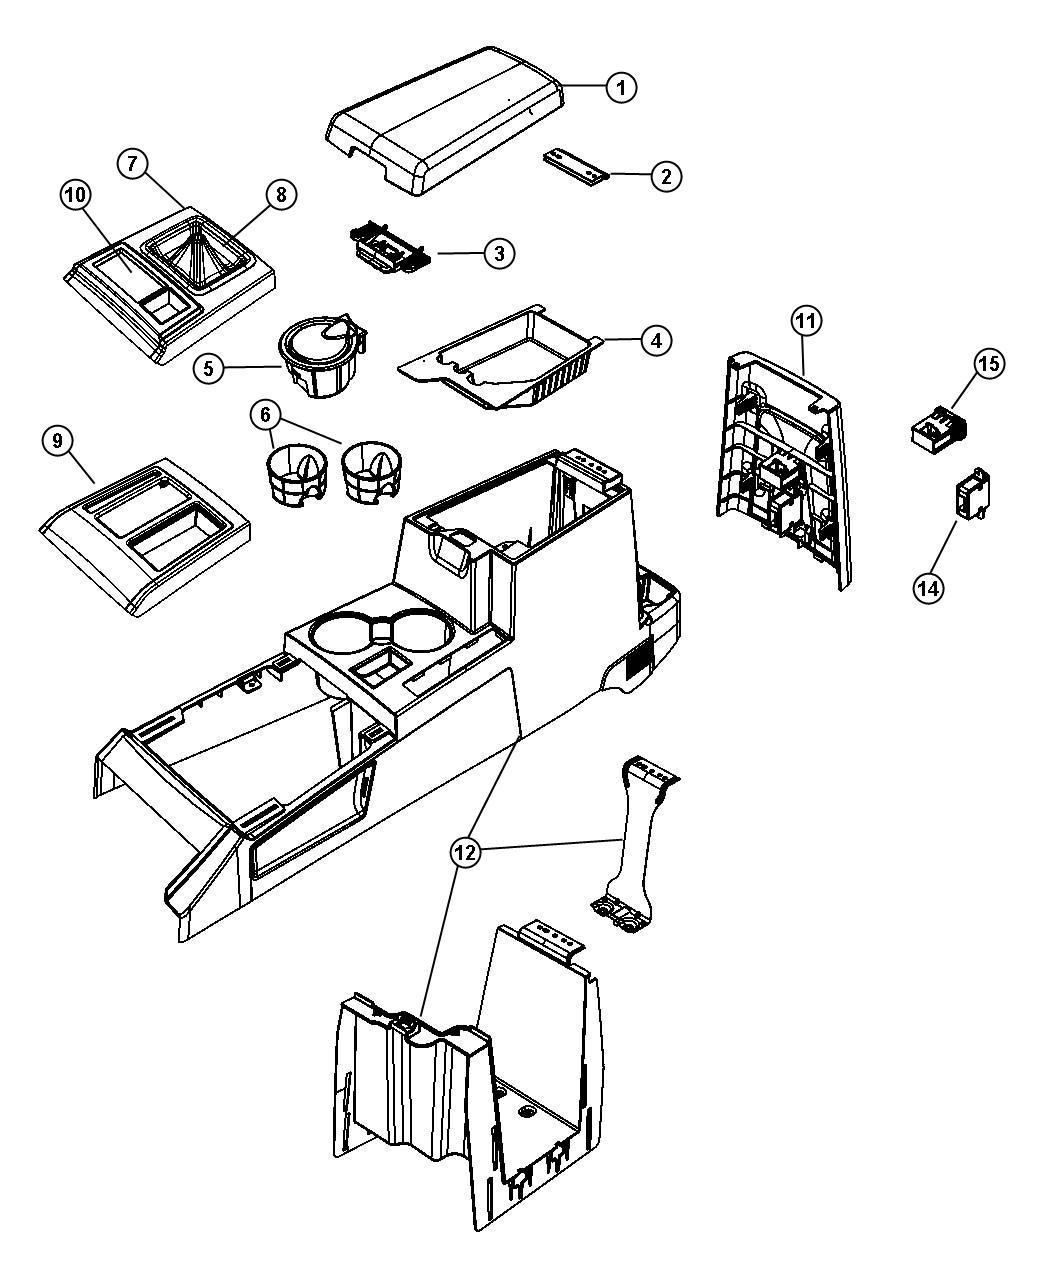 Dodge Nitro Bezel Gear Selector J8 Trim All